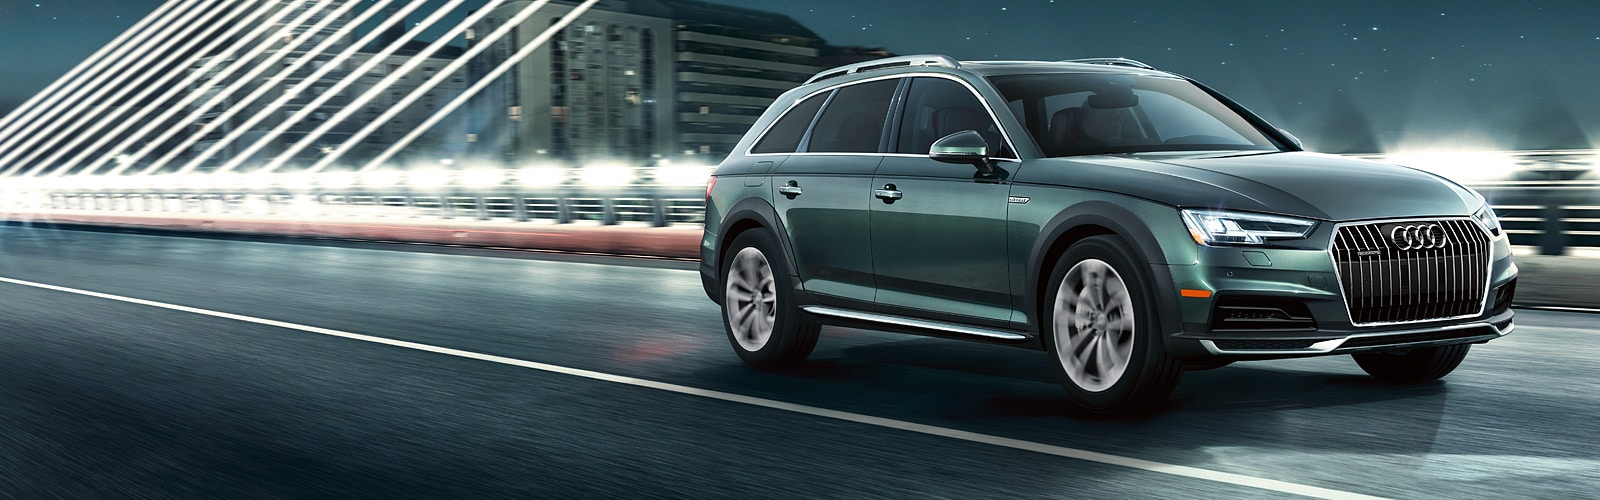 Dallas Audi Dealership Audi Grapevine New Used Car Dealer - Dallas audi